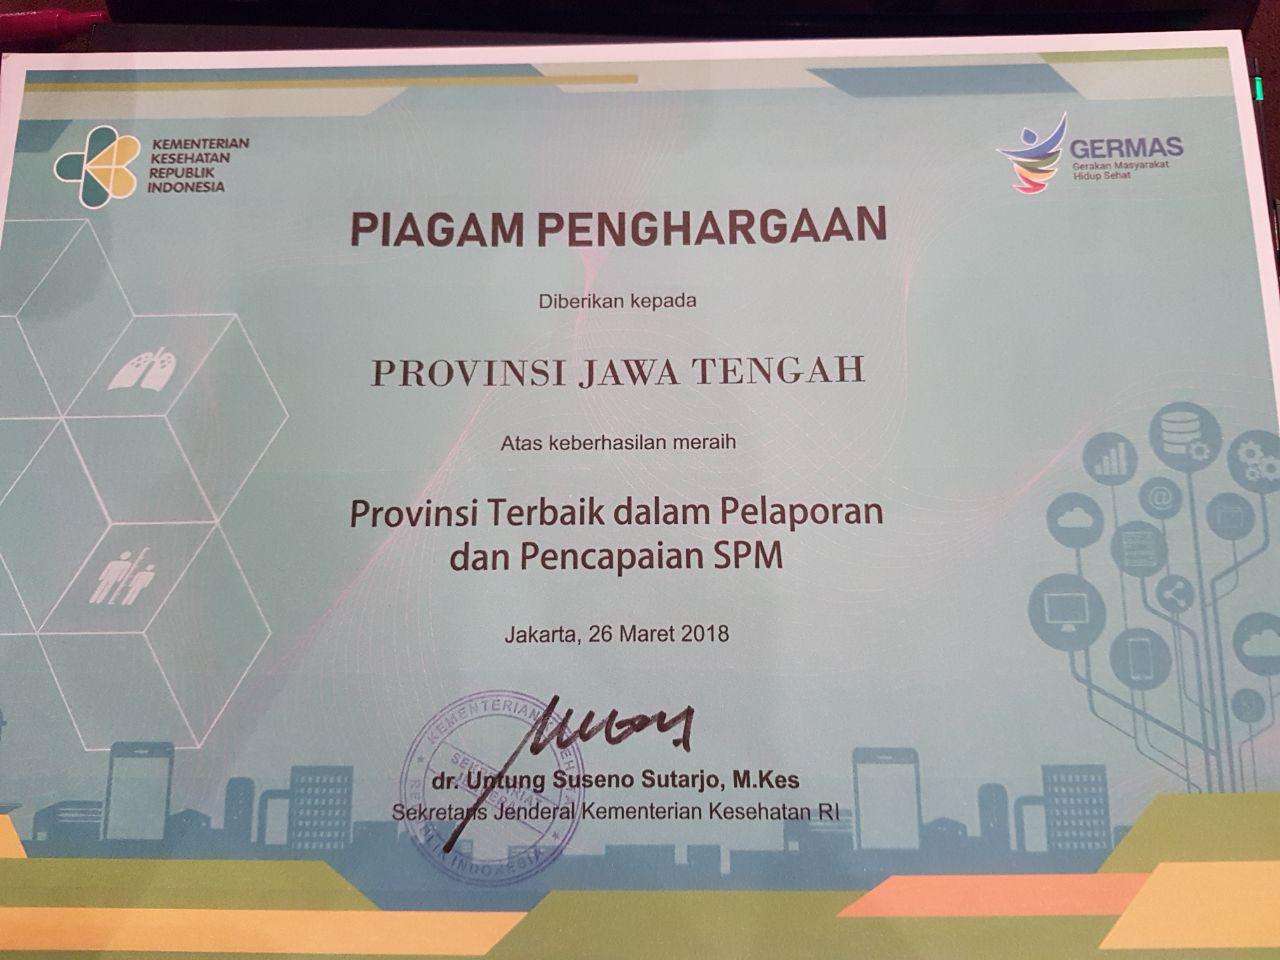 Provinsi Jawa Tengah Provinsi Terbaik Dalam Pelaporan dan Pencapaian SPM